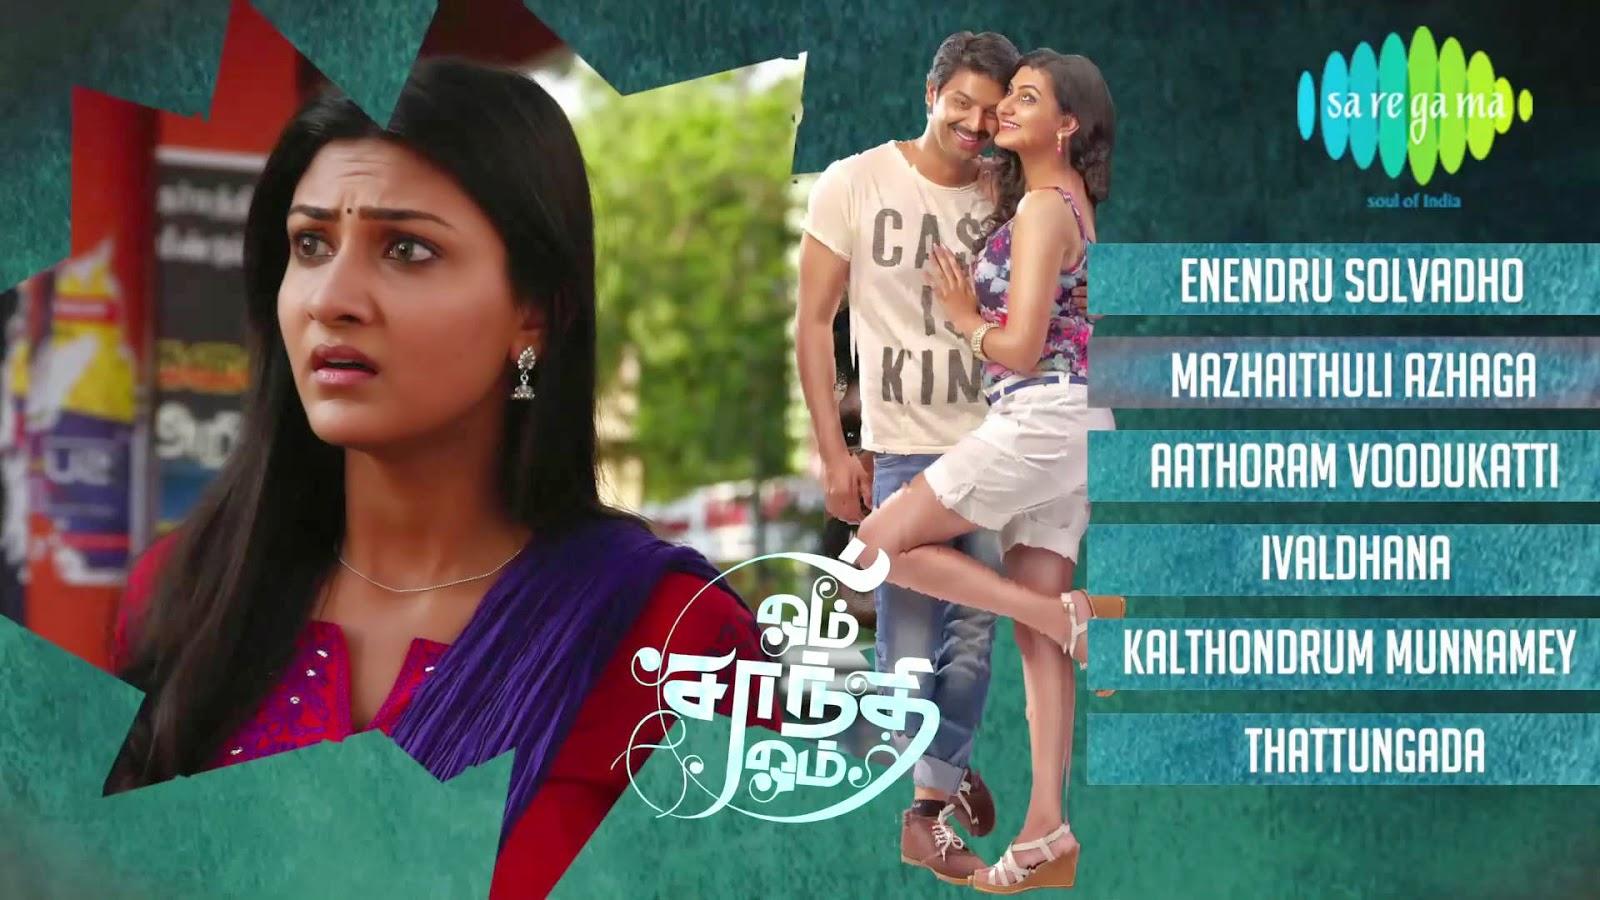 Neelam tamil movie songs : Jersey shore movie trailer